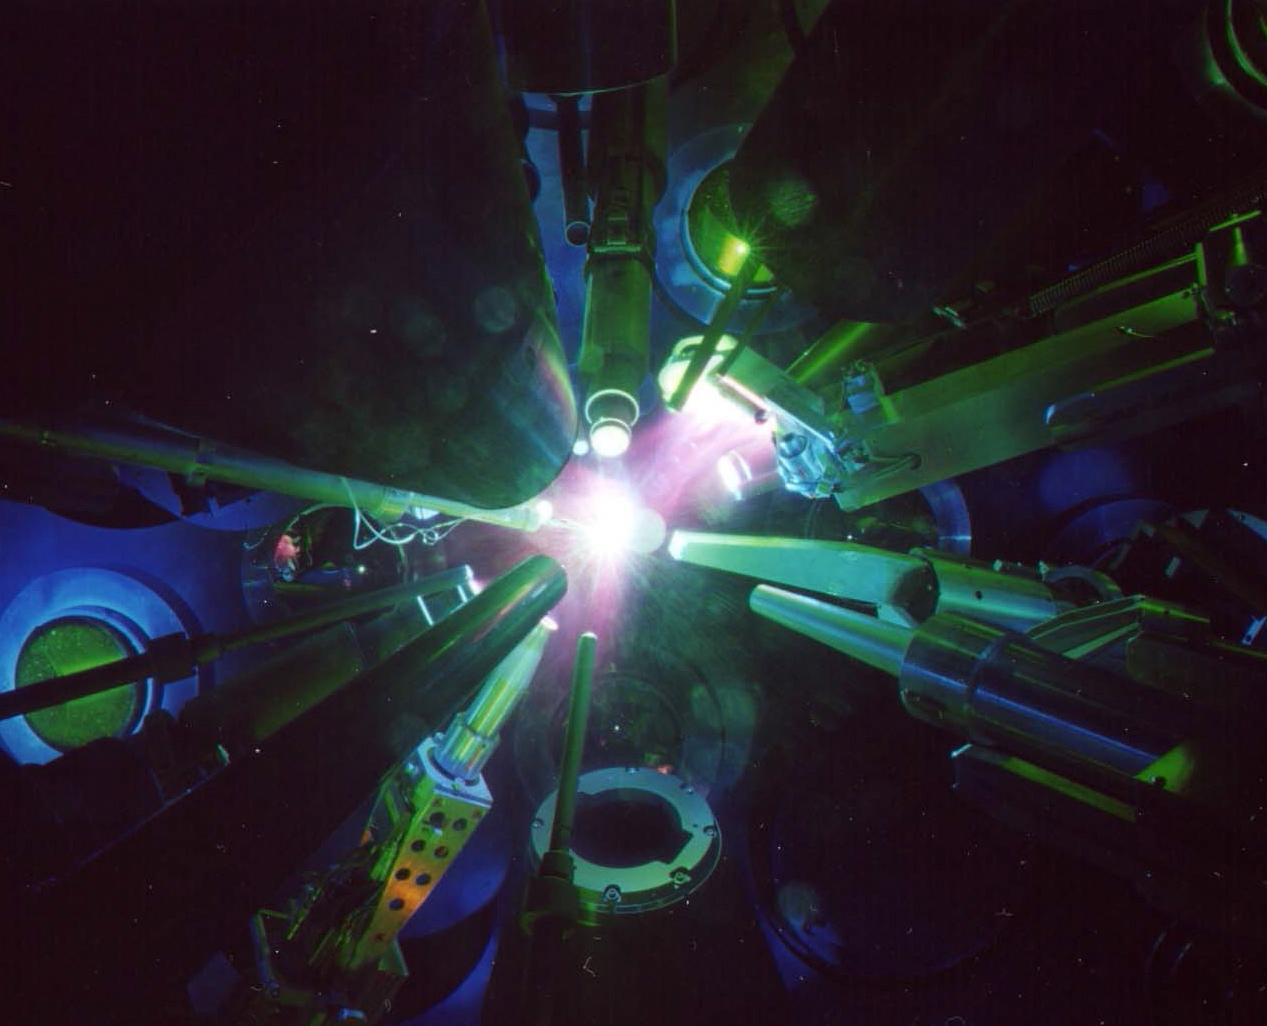 Inertial Confinement Fusion